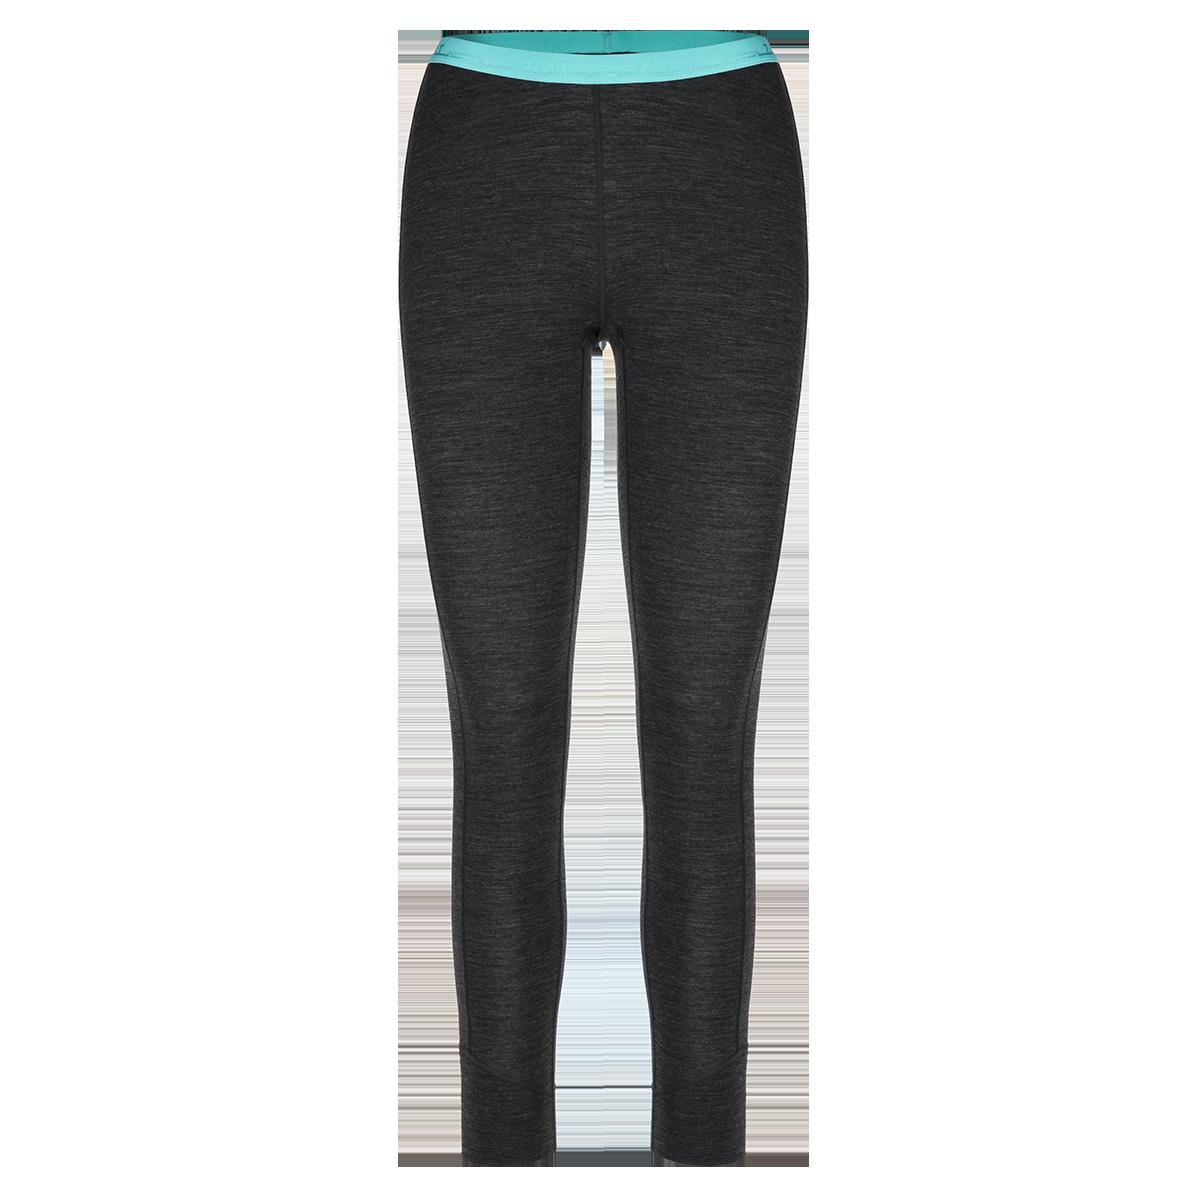 Zajo Elsa Merino W Pants Black/Gray 3